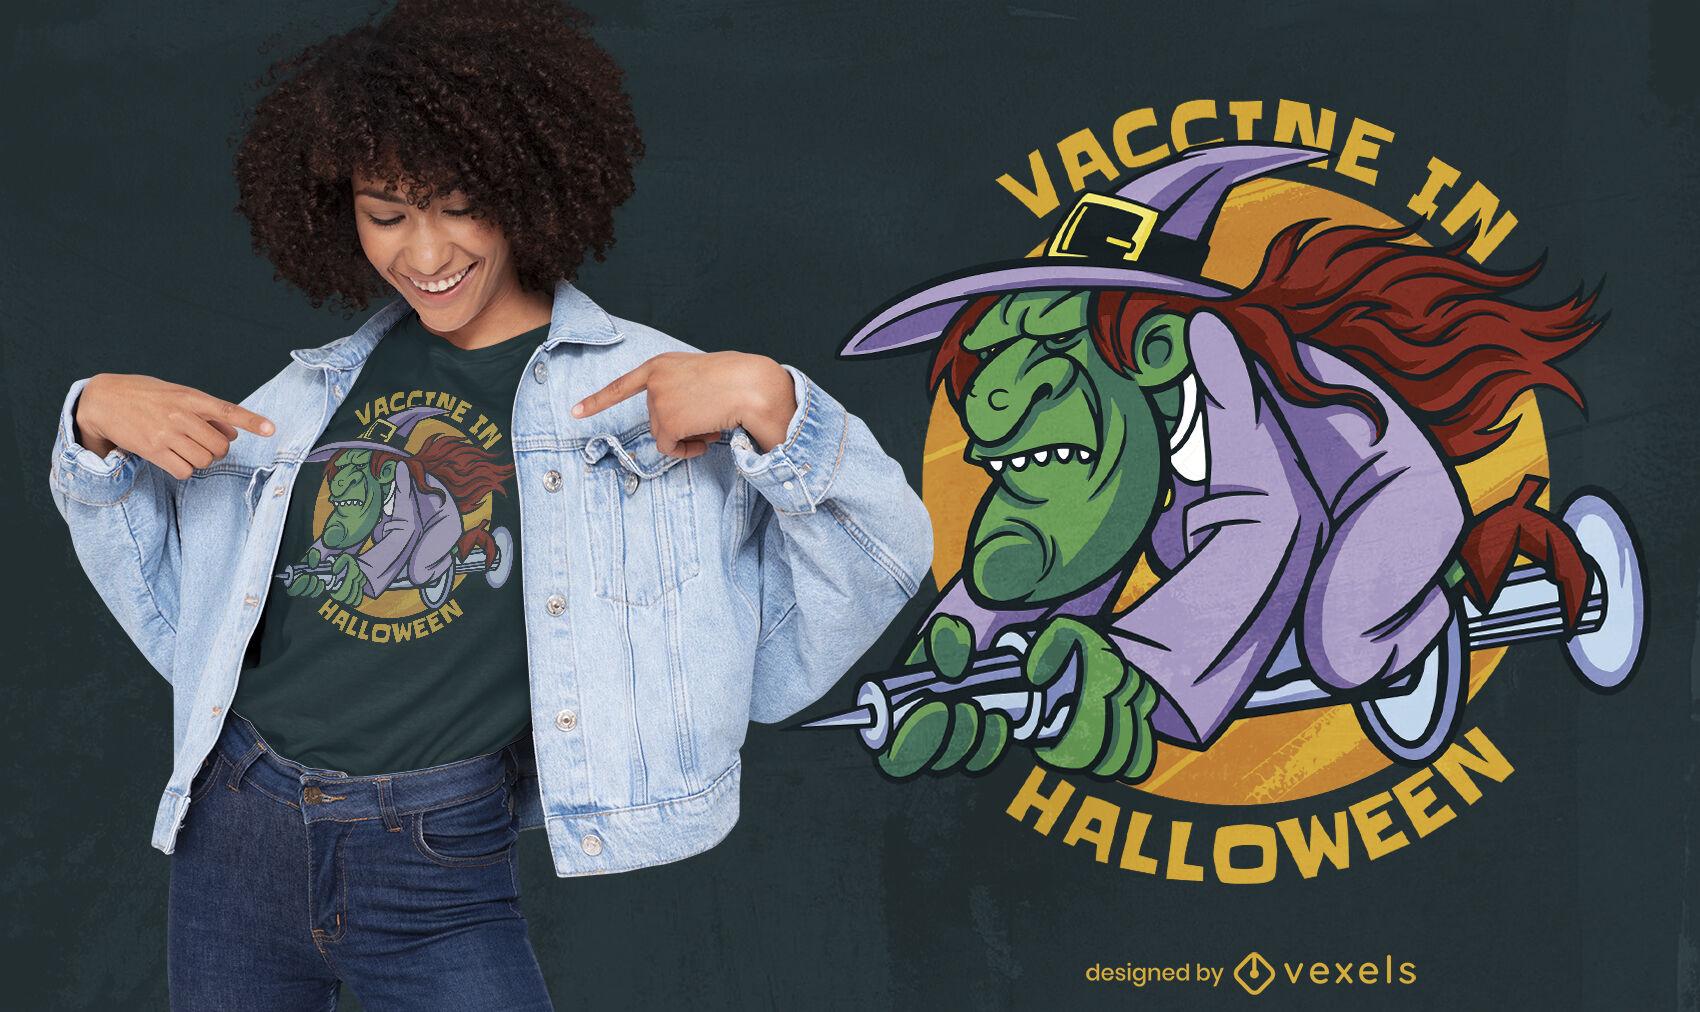 Cool vaccine in halloween t-shirt design